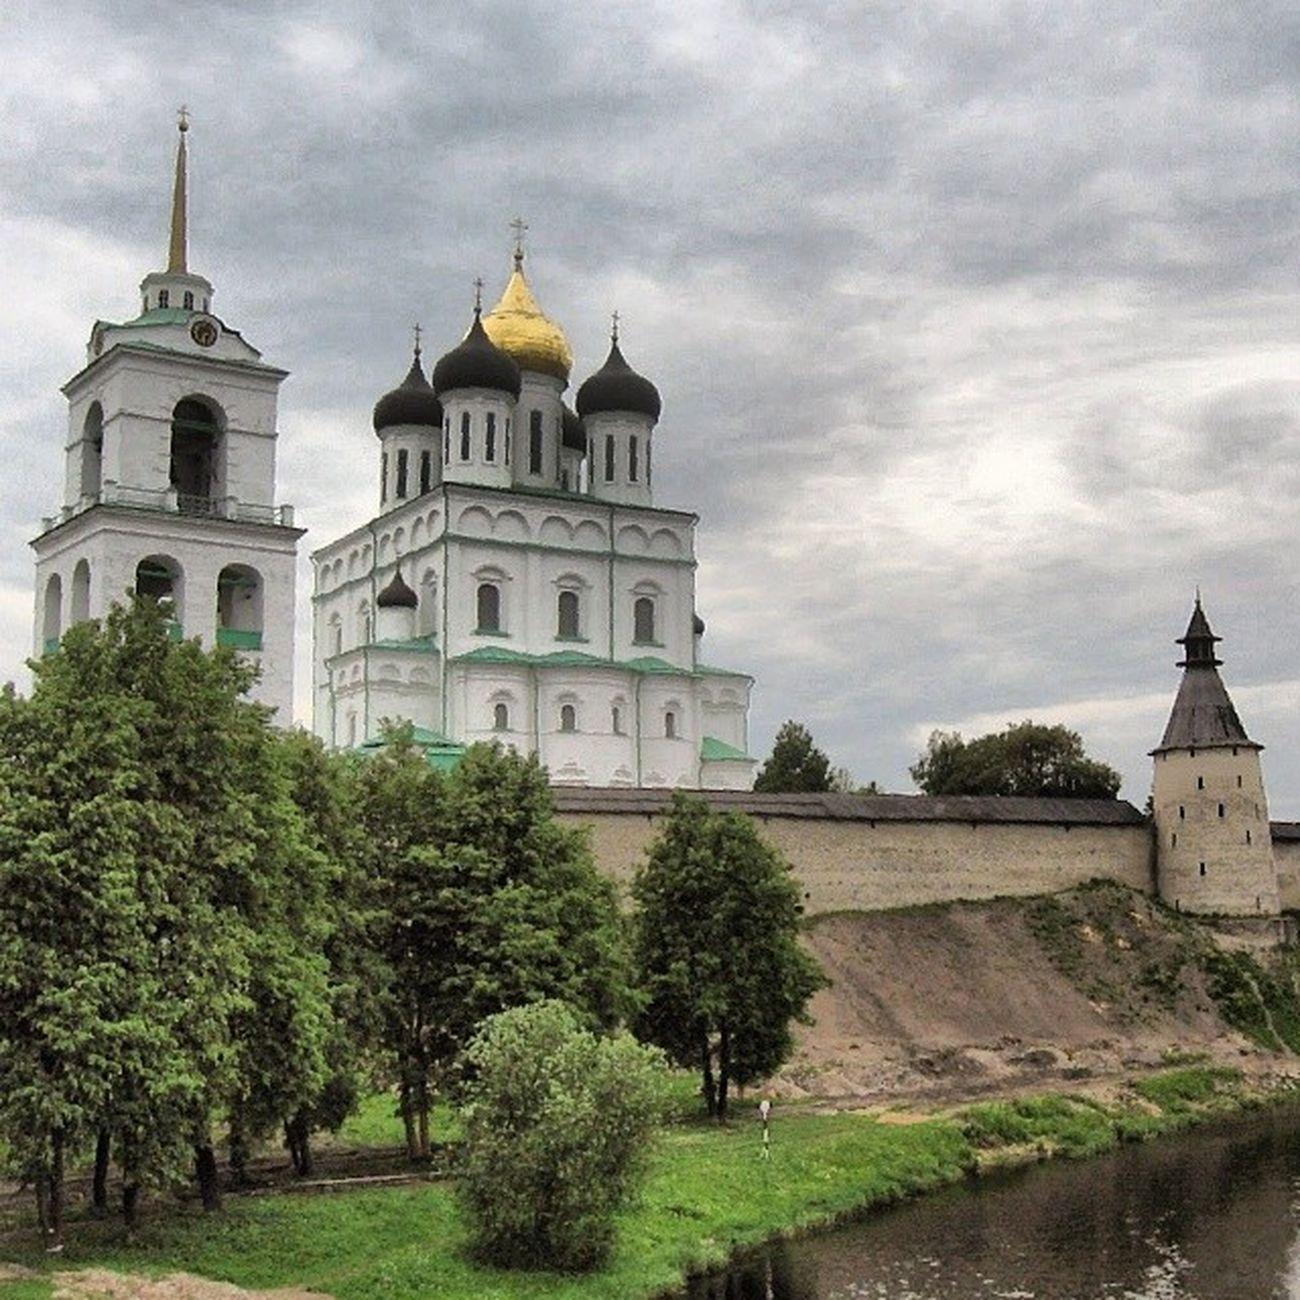 Pskov Russia Castle Church traveltravellingtravelerarchitecturebuildbuildingstravelholidaystripbeautifulwonderfulviewlandscapetowntravelgraminstatravellol